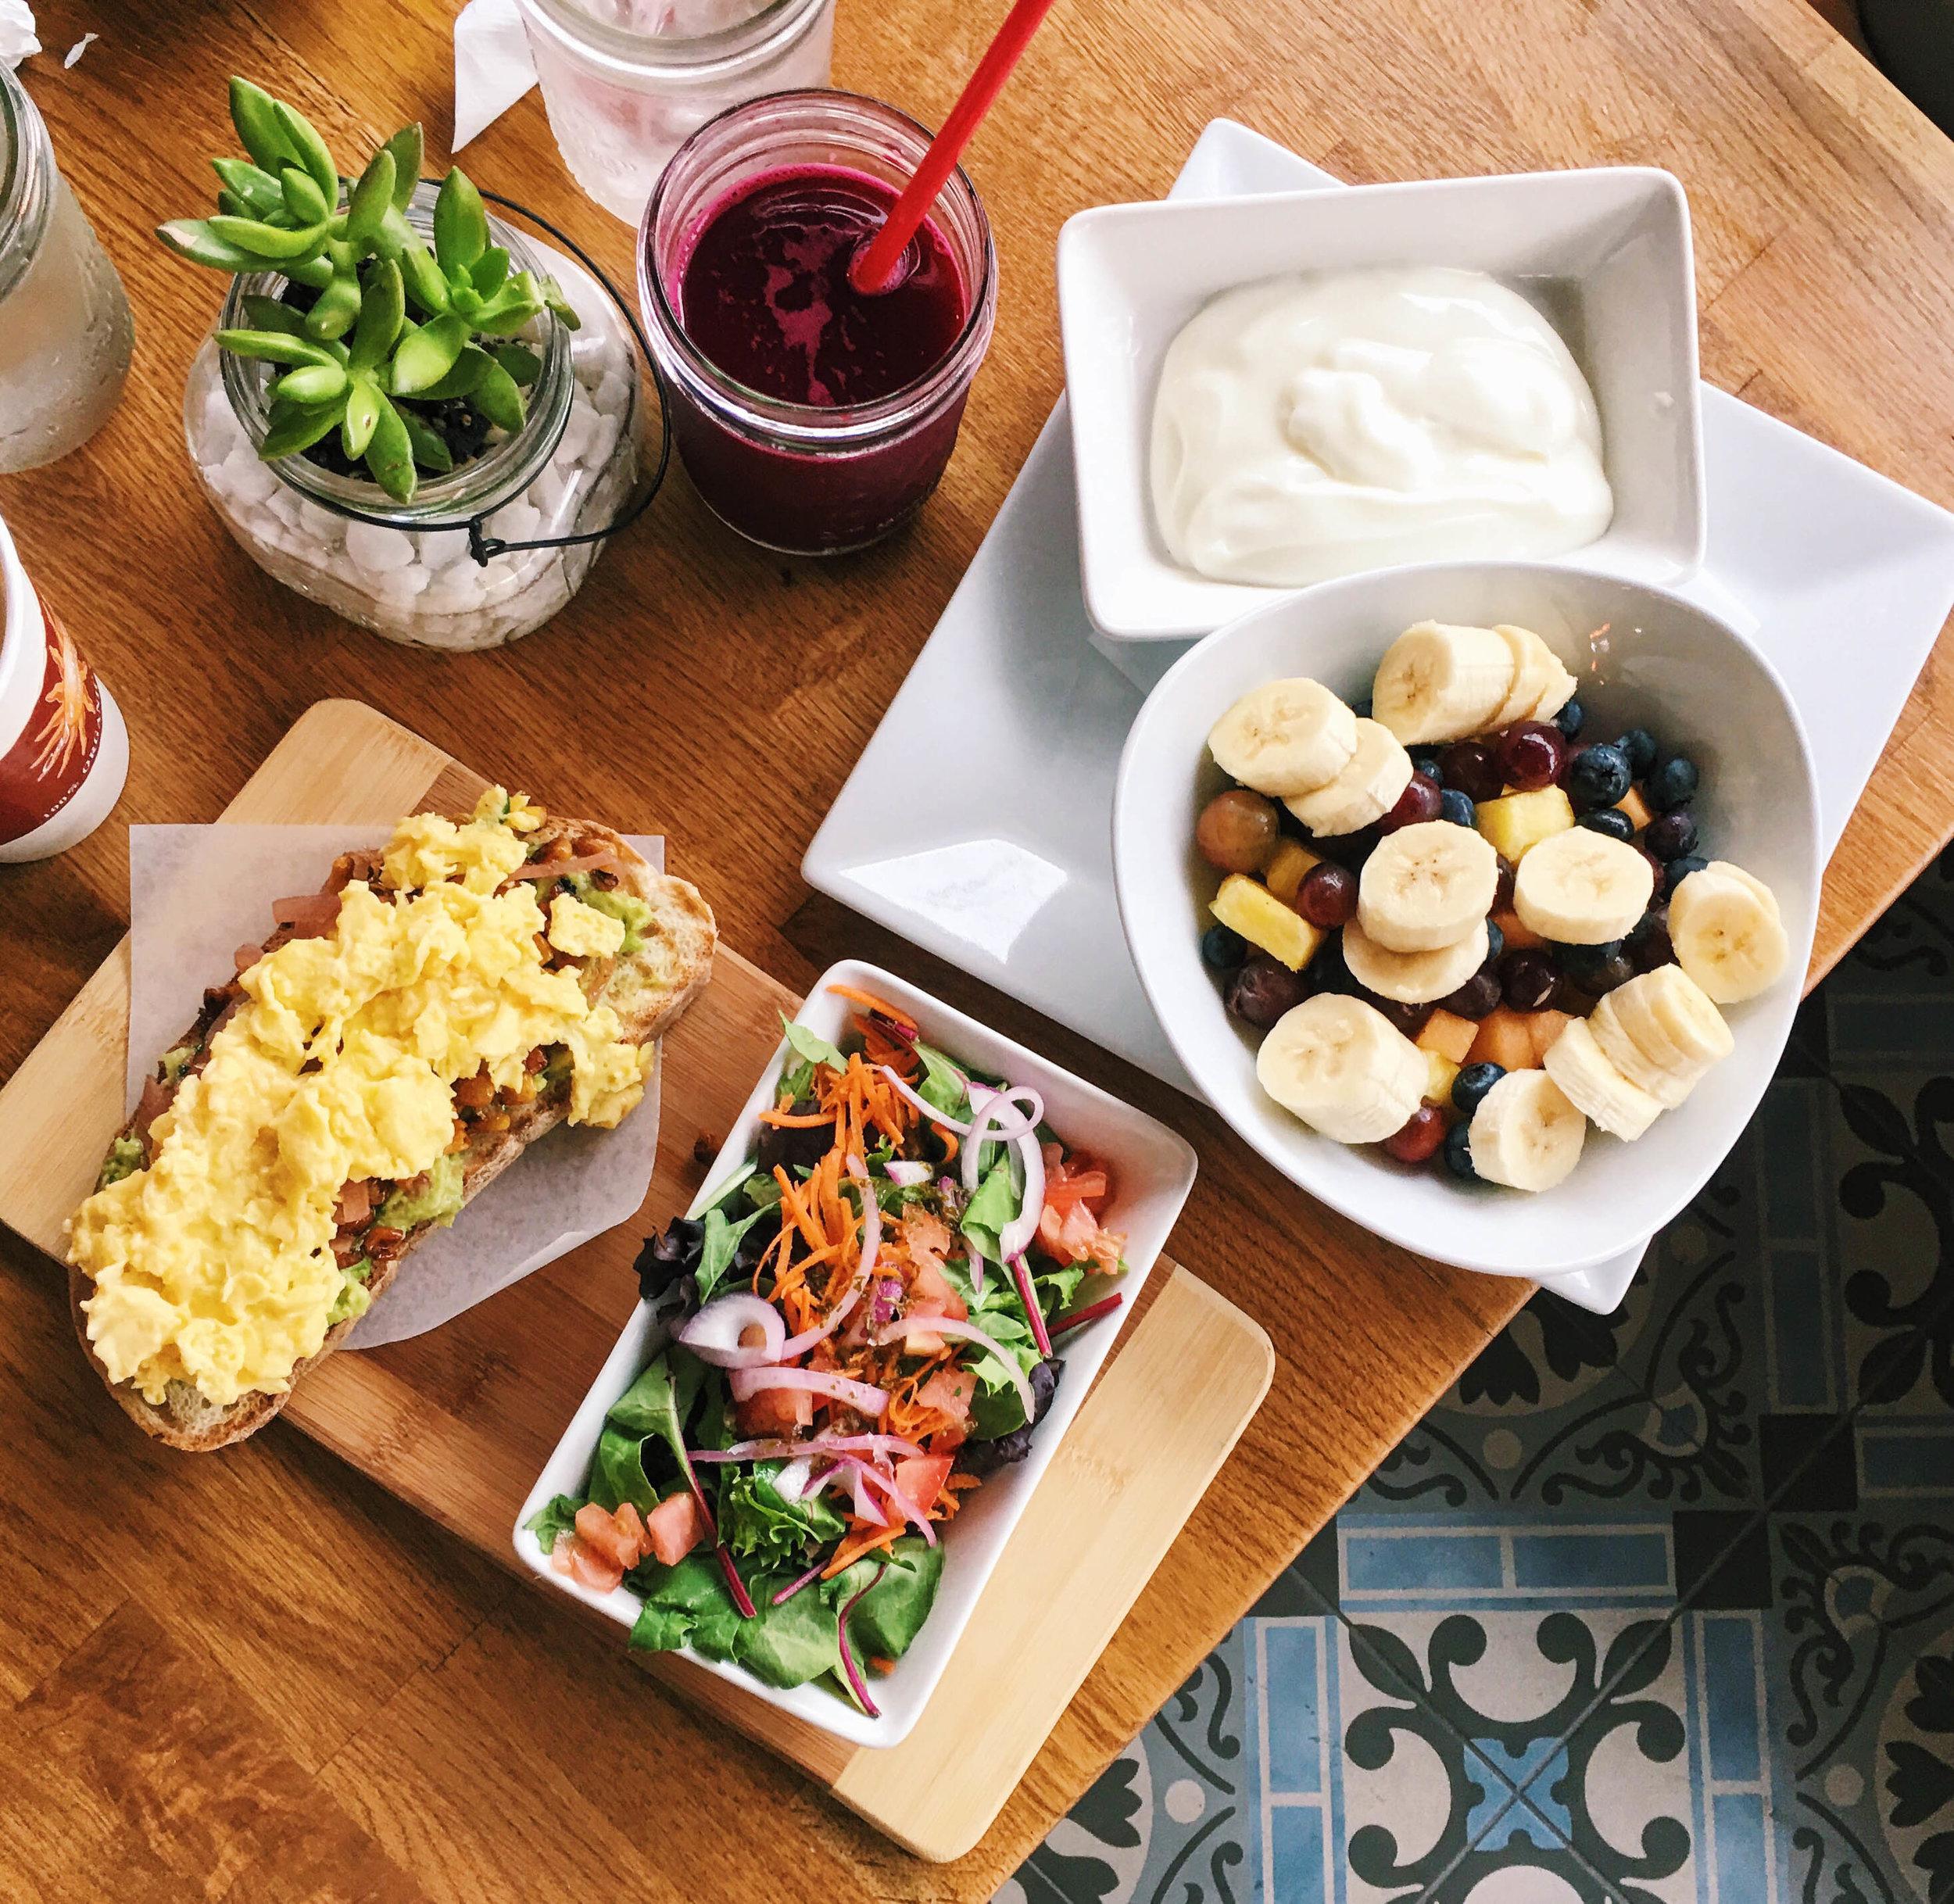 Avocado Toast, Fruit Plate, and Detox Juice, Café Solar, Westchester, CA